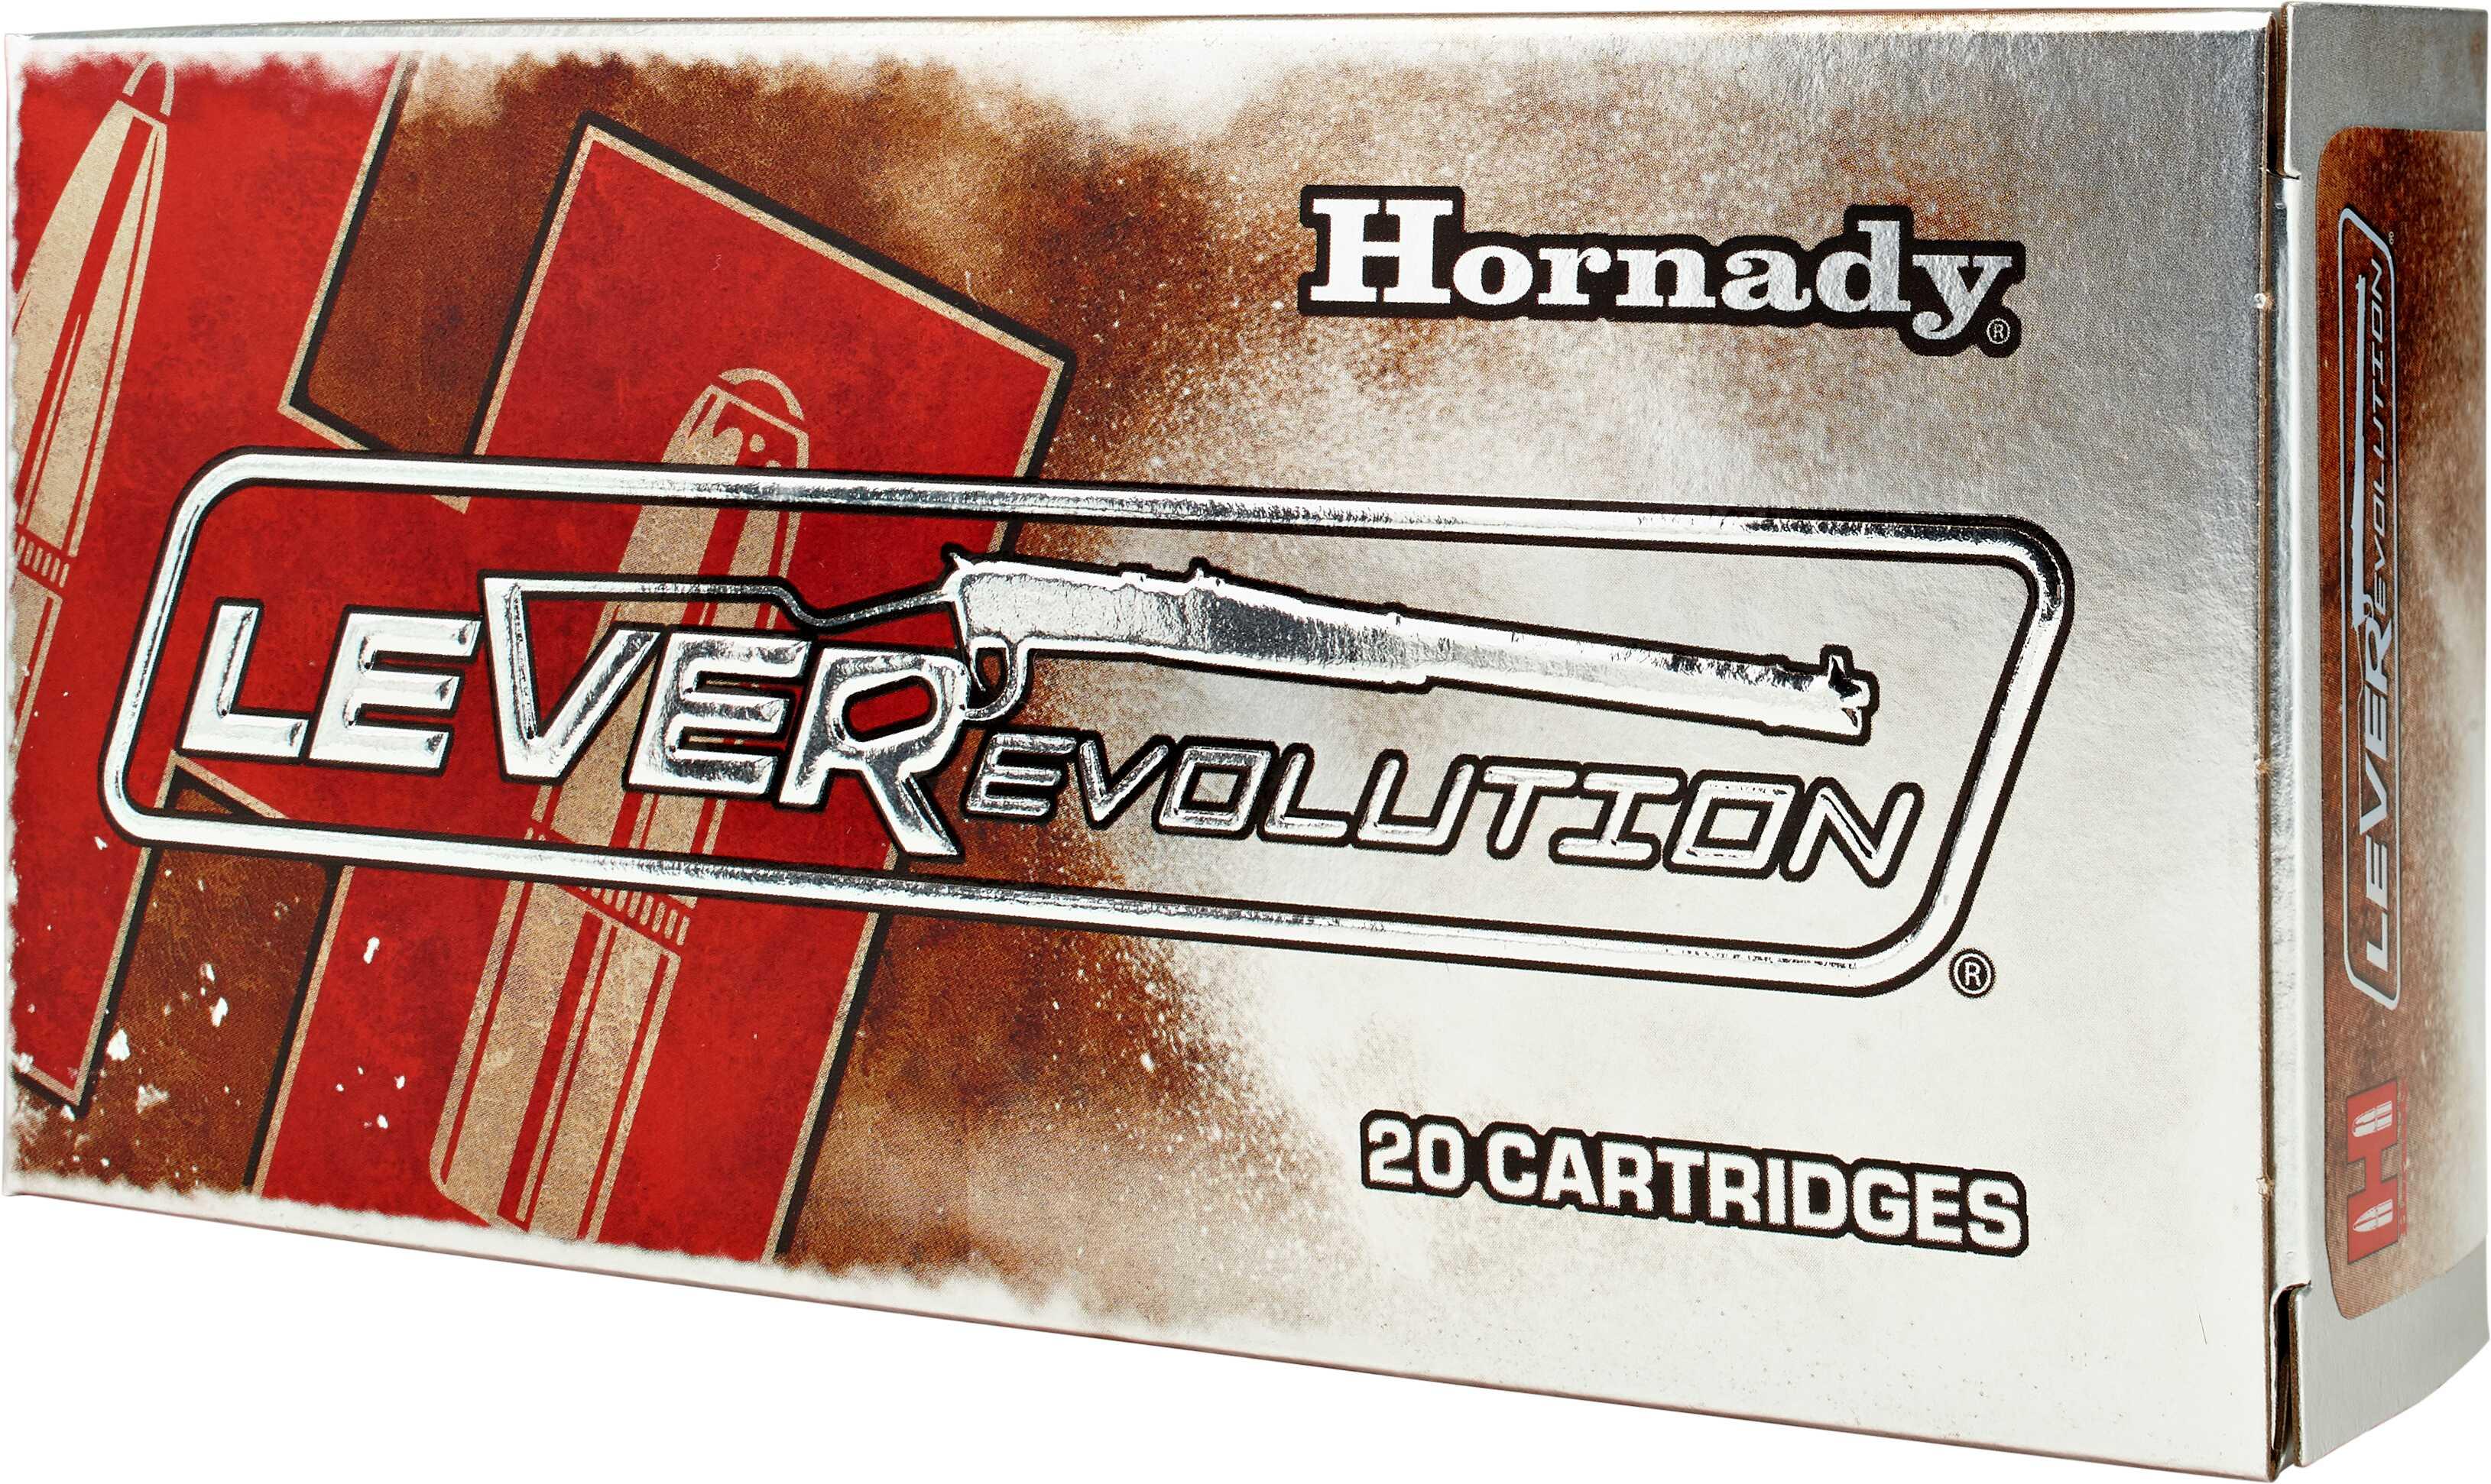 Hornady 45 Colt 225 Grain FTX Leverevolution Per 20 Md: 92792 Ammunition